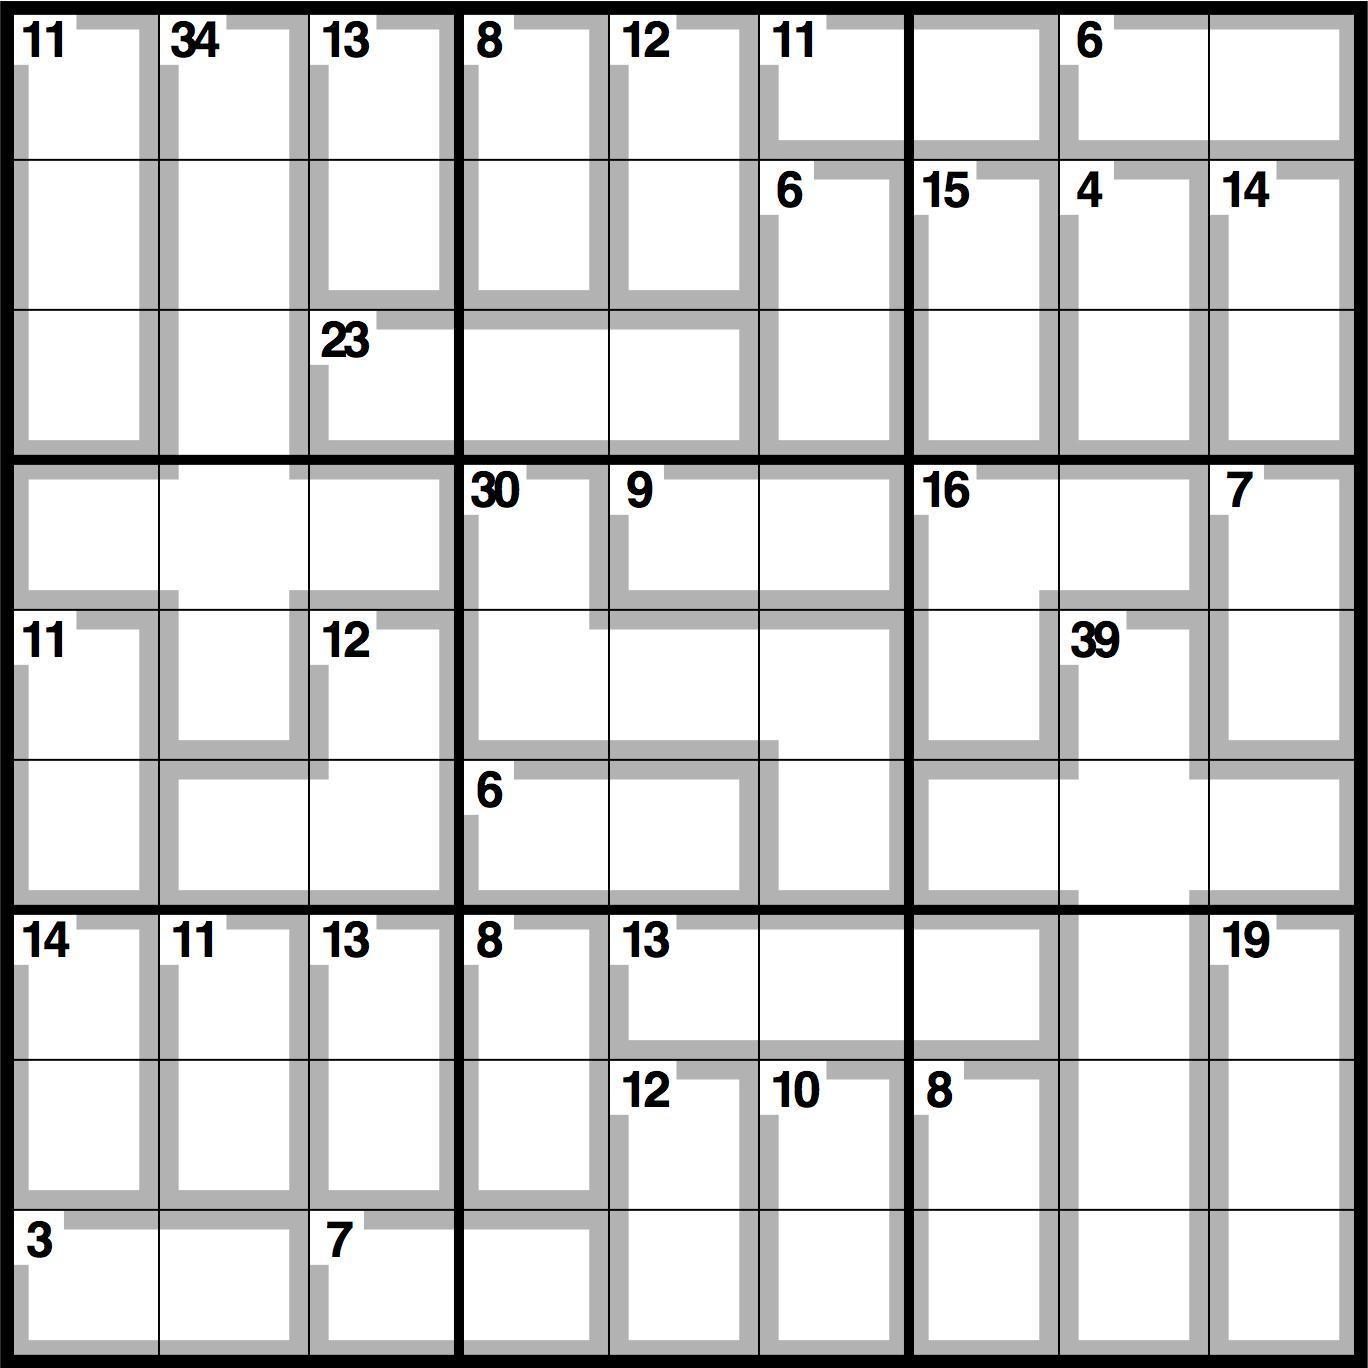 sudoku blank grid